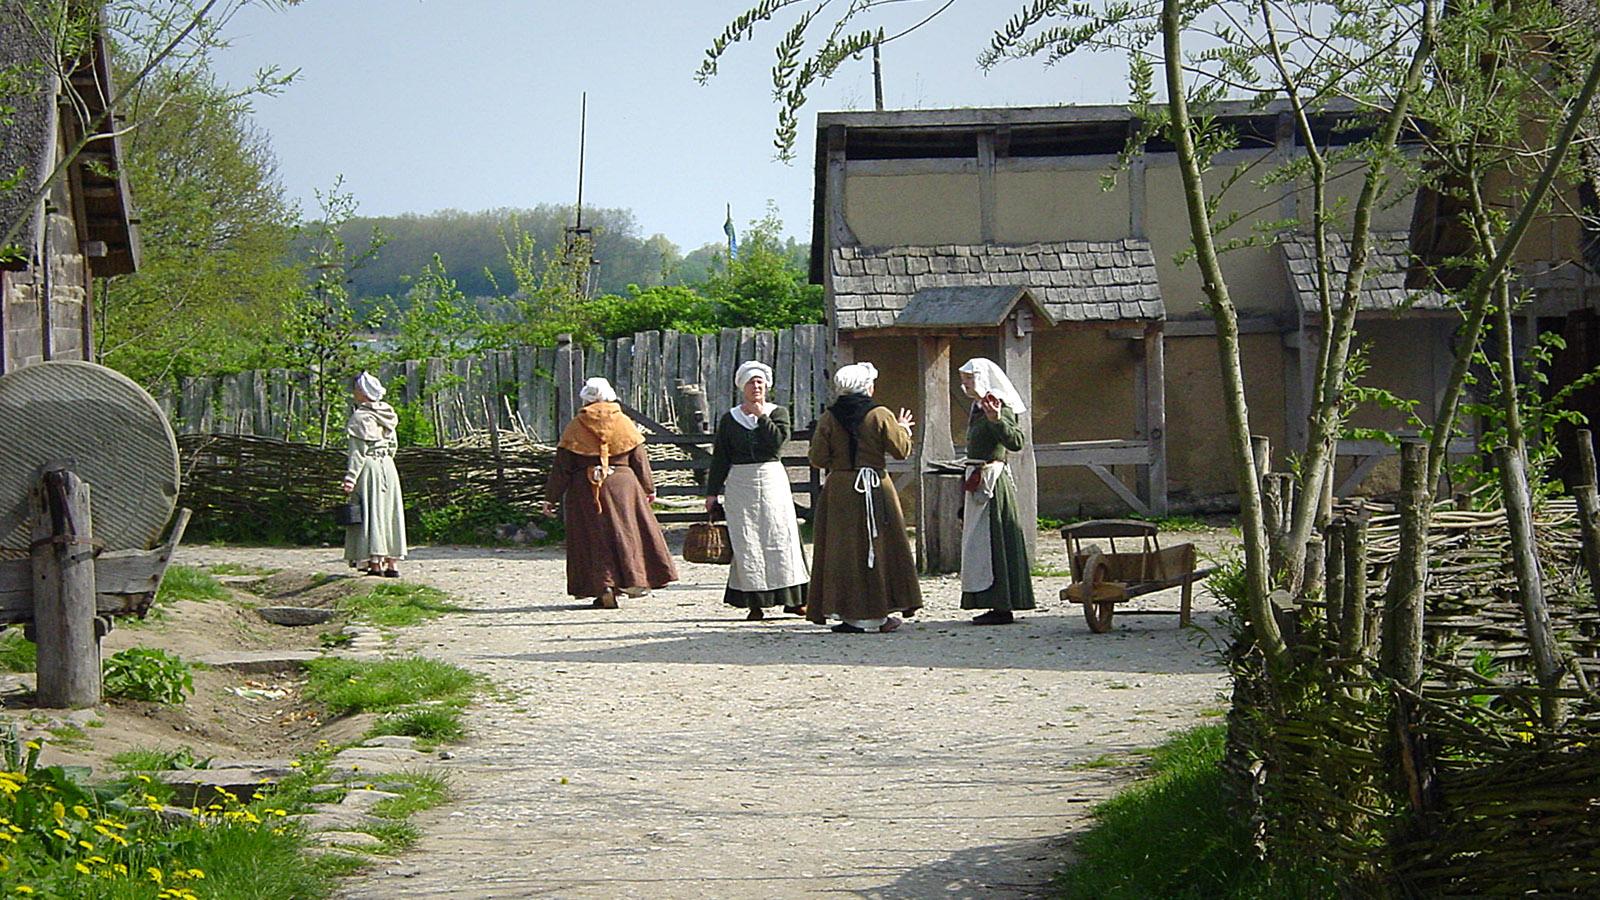 Dorfleben im Mittelalter-Zentrum. Foto: Hilke Maunder